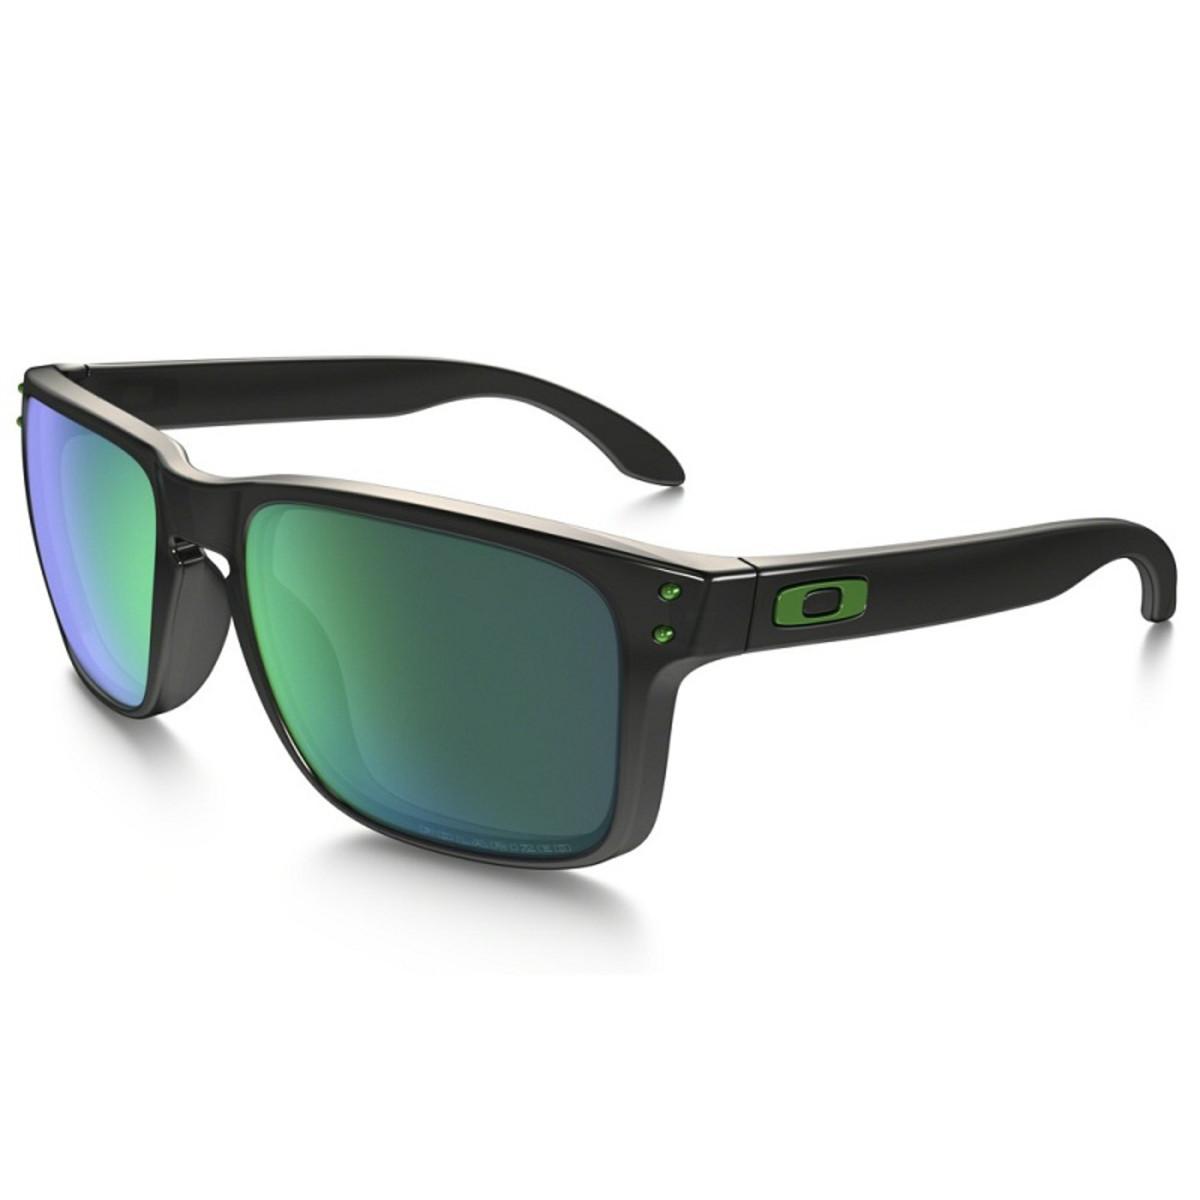 87c17f849c4d6 Óculos Oakley Holbrook Polished Black  Lente Jade Iridium Polarizado ...